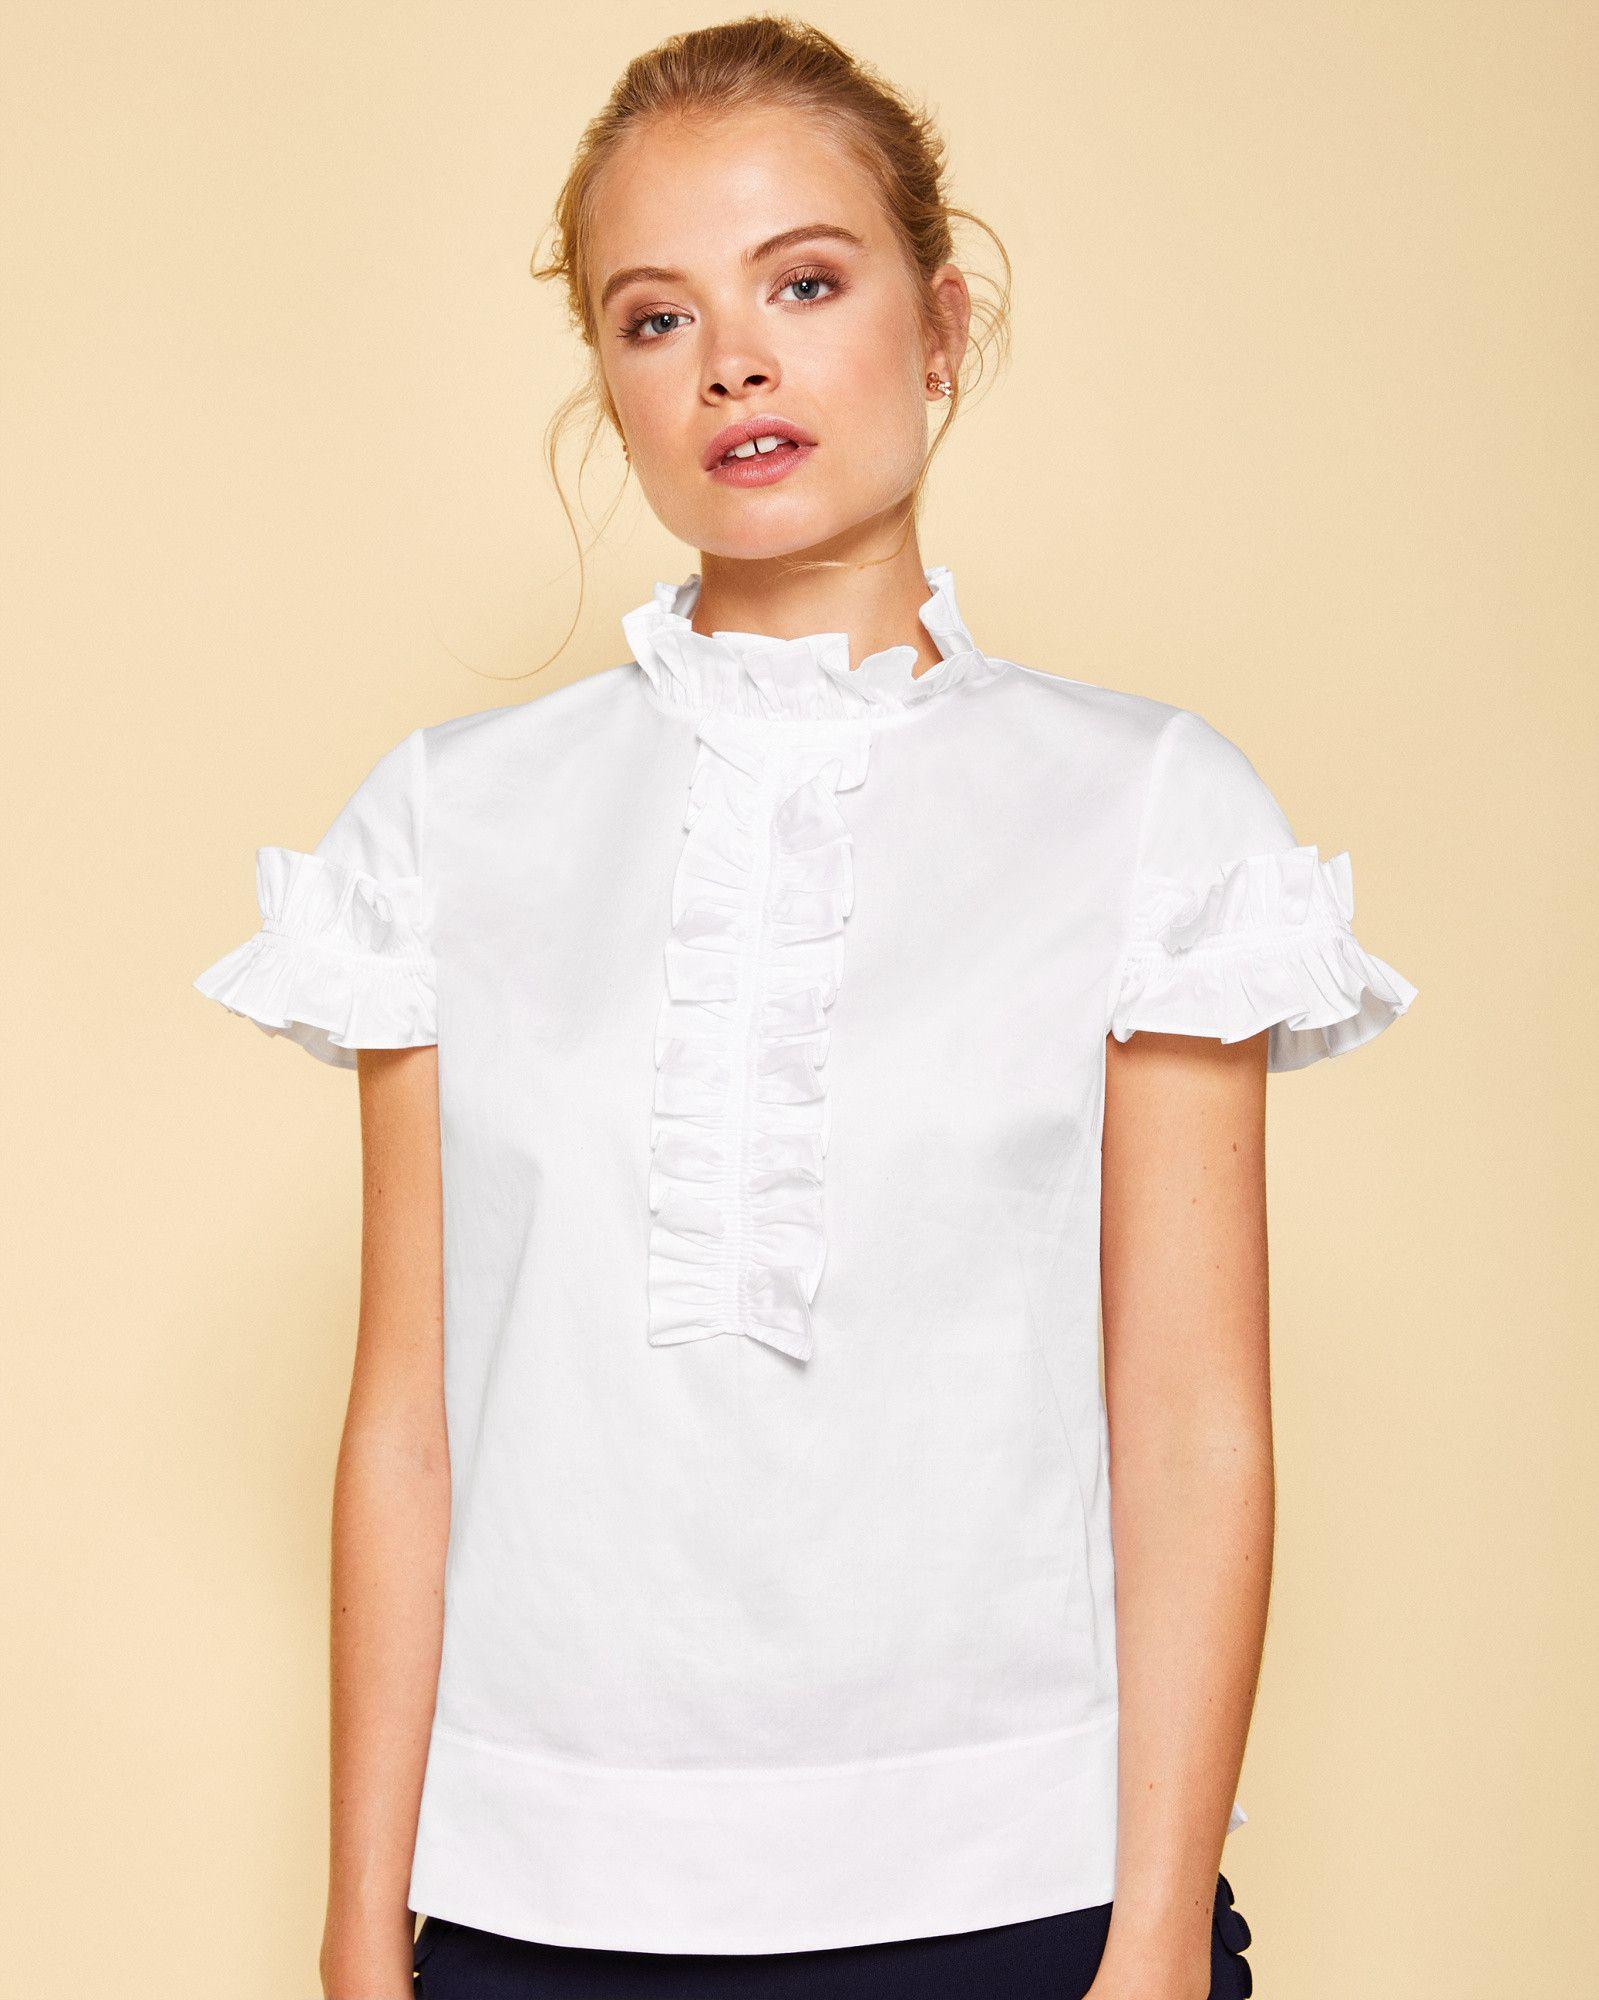 b2d56ec6416d54 Ted Baker Frill detail cotton blouse White | Products | Blusas